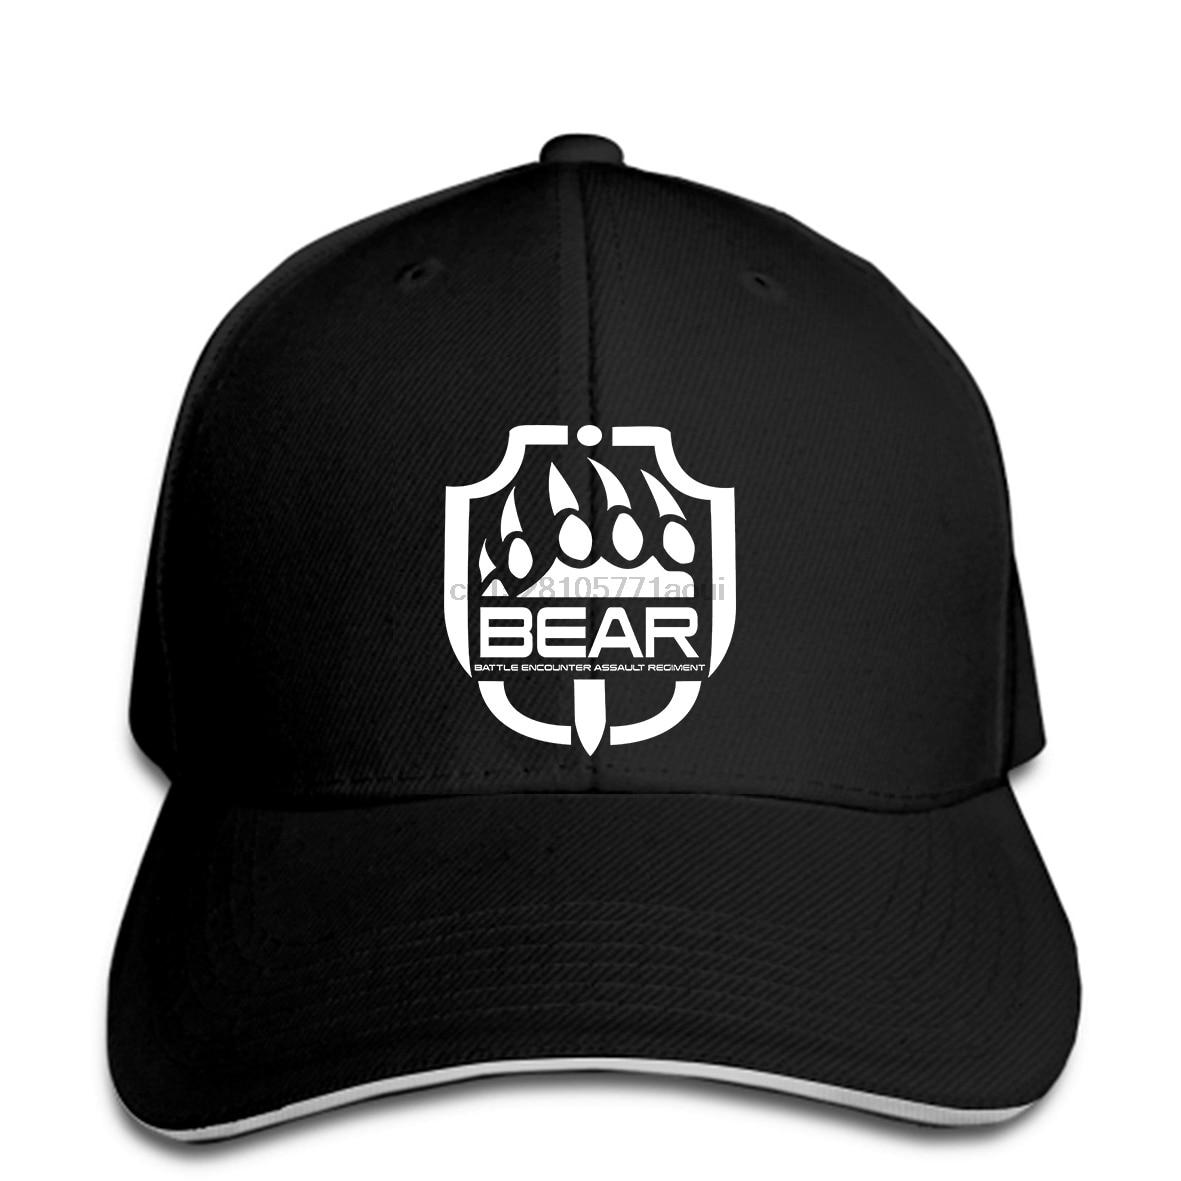 Baseball cap Escape from Tarkov BEAR NEW hat